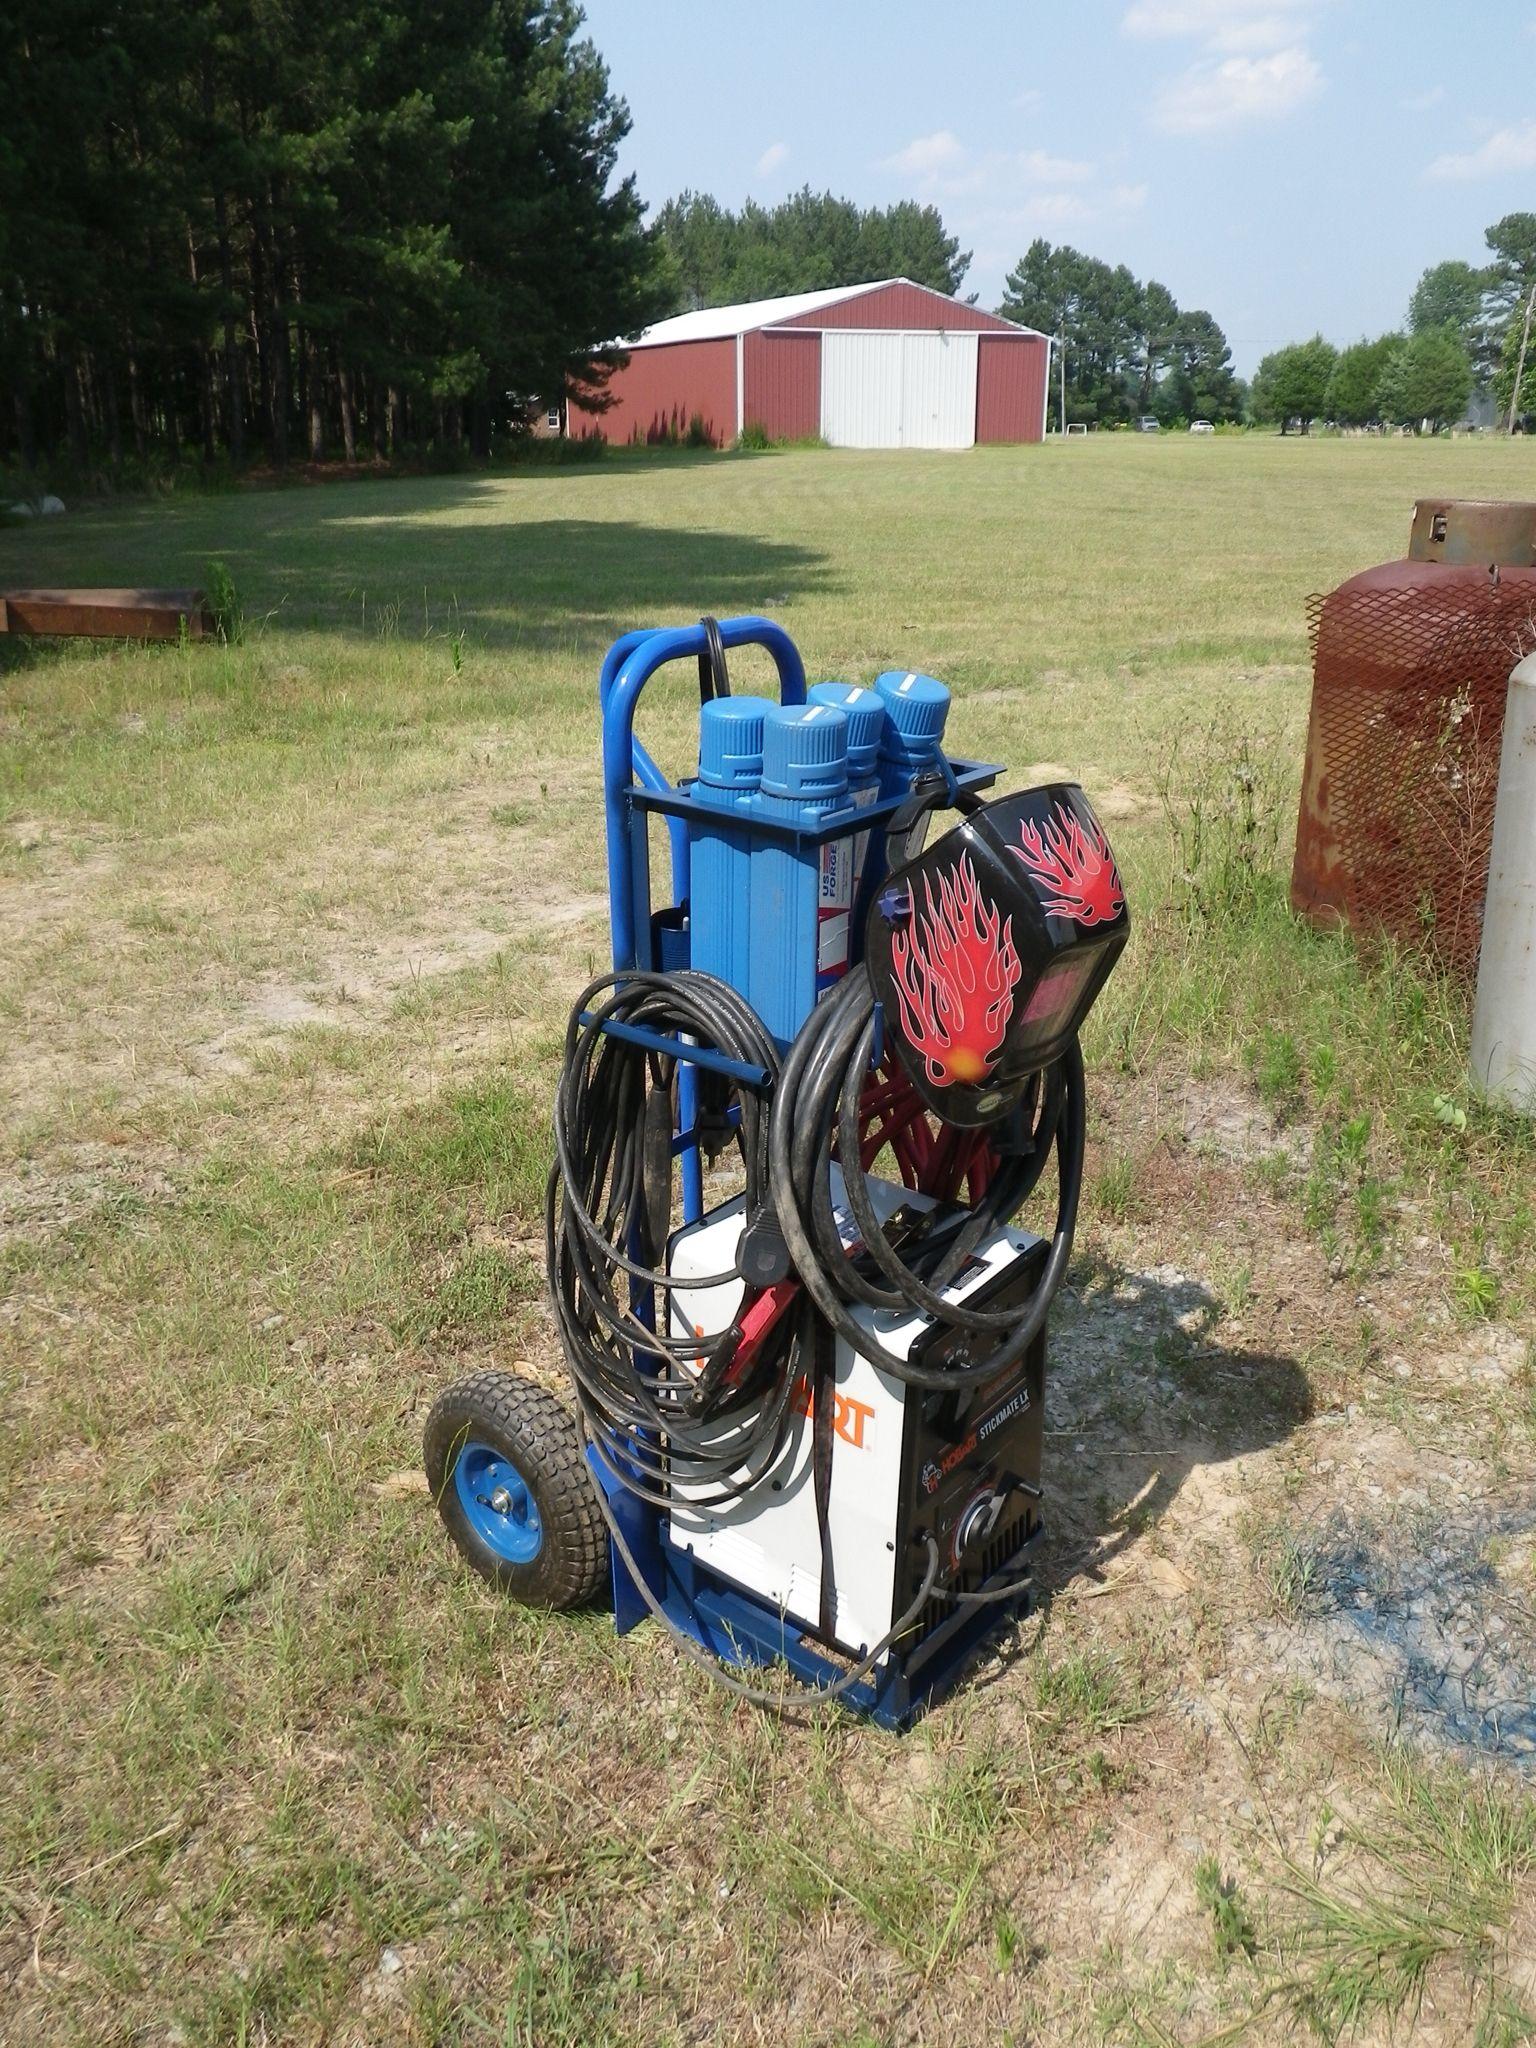 Stick welder hand cart fully loaded Welding projects